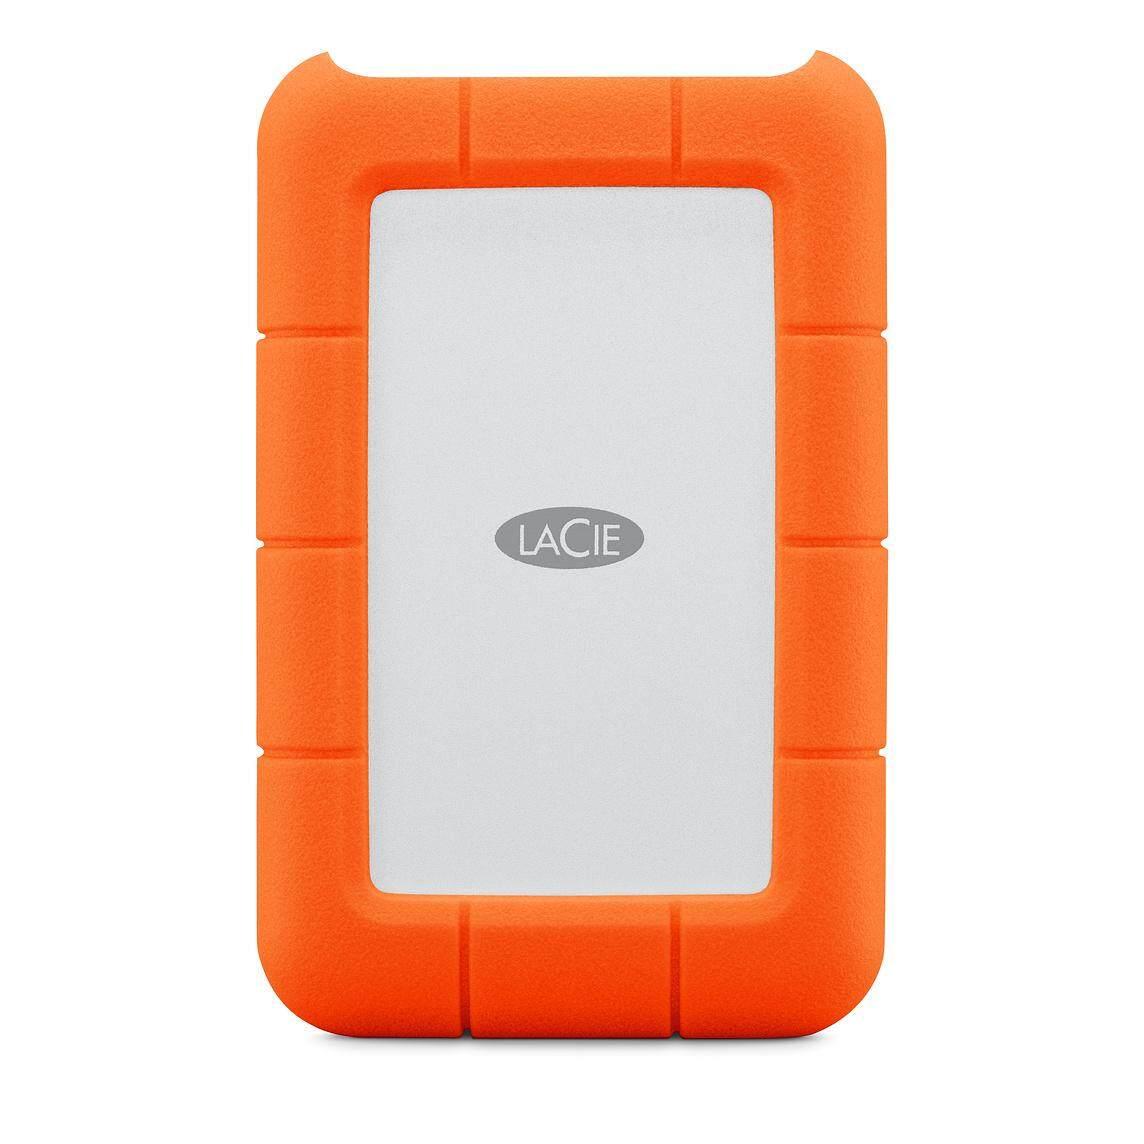 LaCie Rugged 1TB/2TB/4TB/5TB Portable Hard Disk Drive - USB 3.1 Type-C External Hard Disk Drive